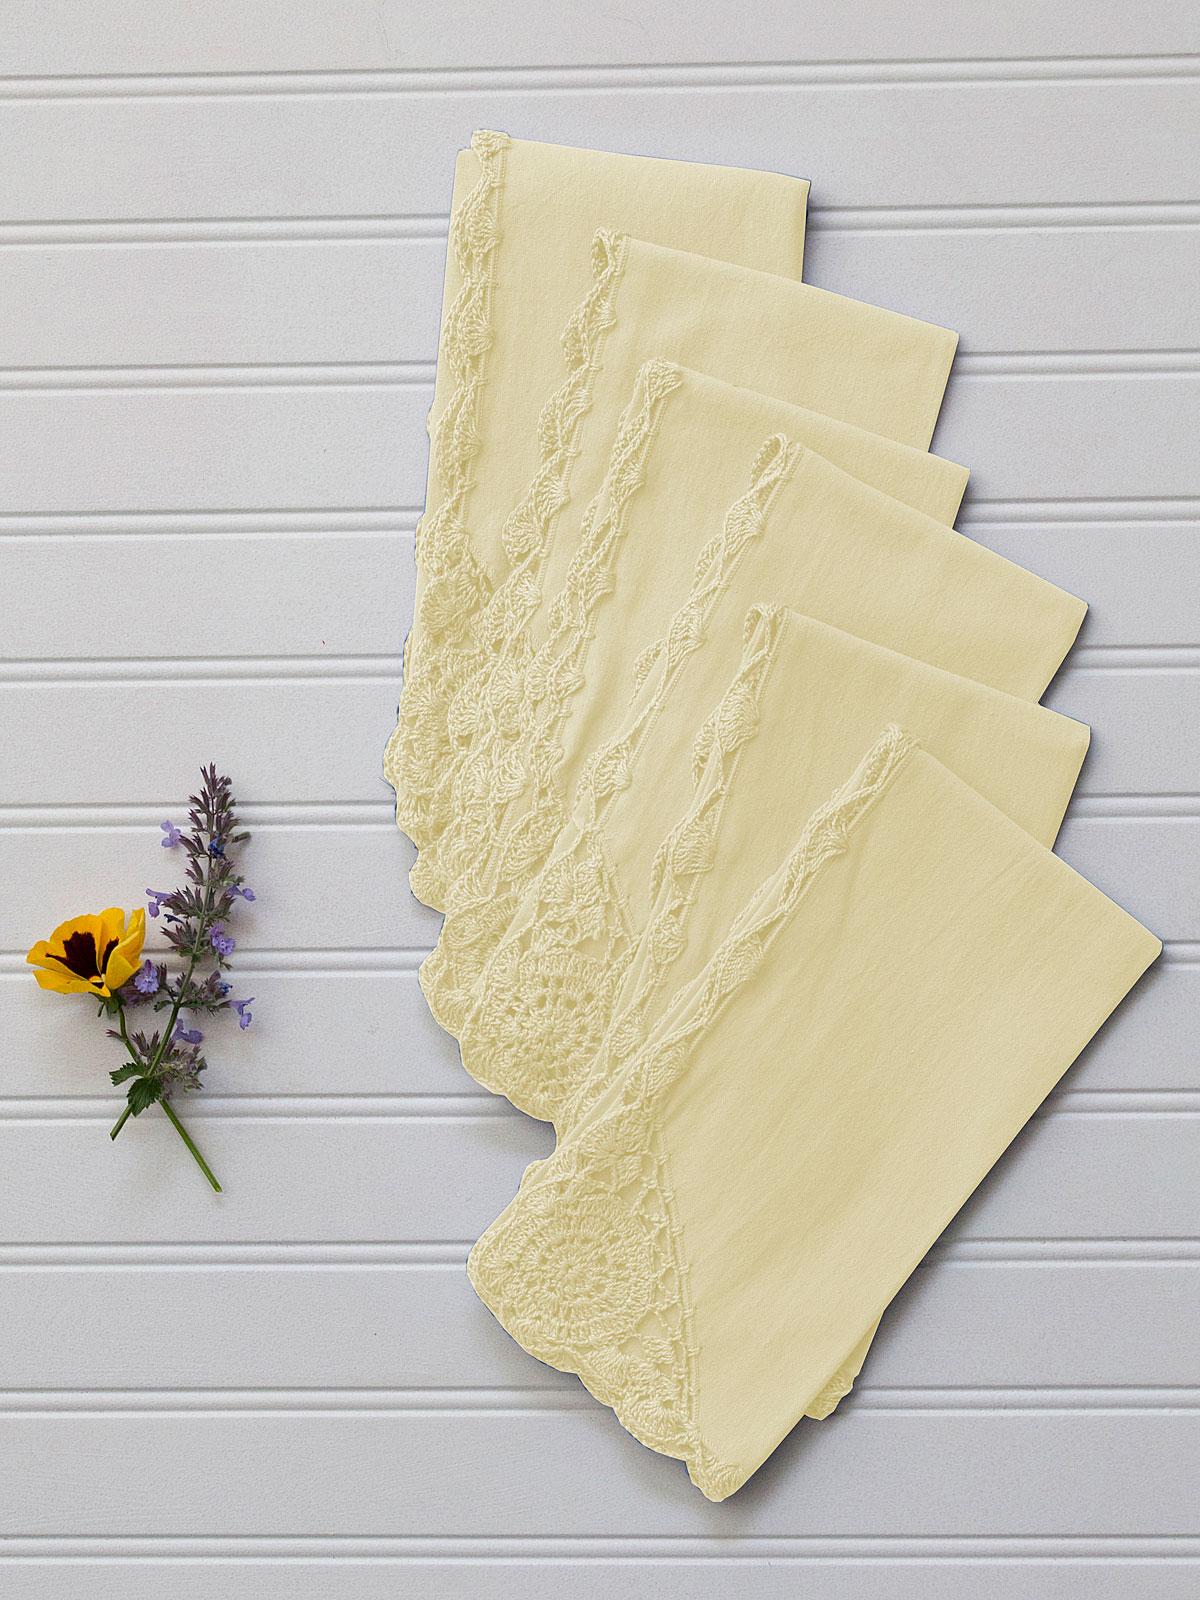 Cora's Crochet Trim Napkins Set of 6 - Butter